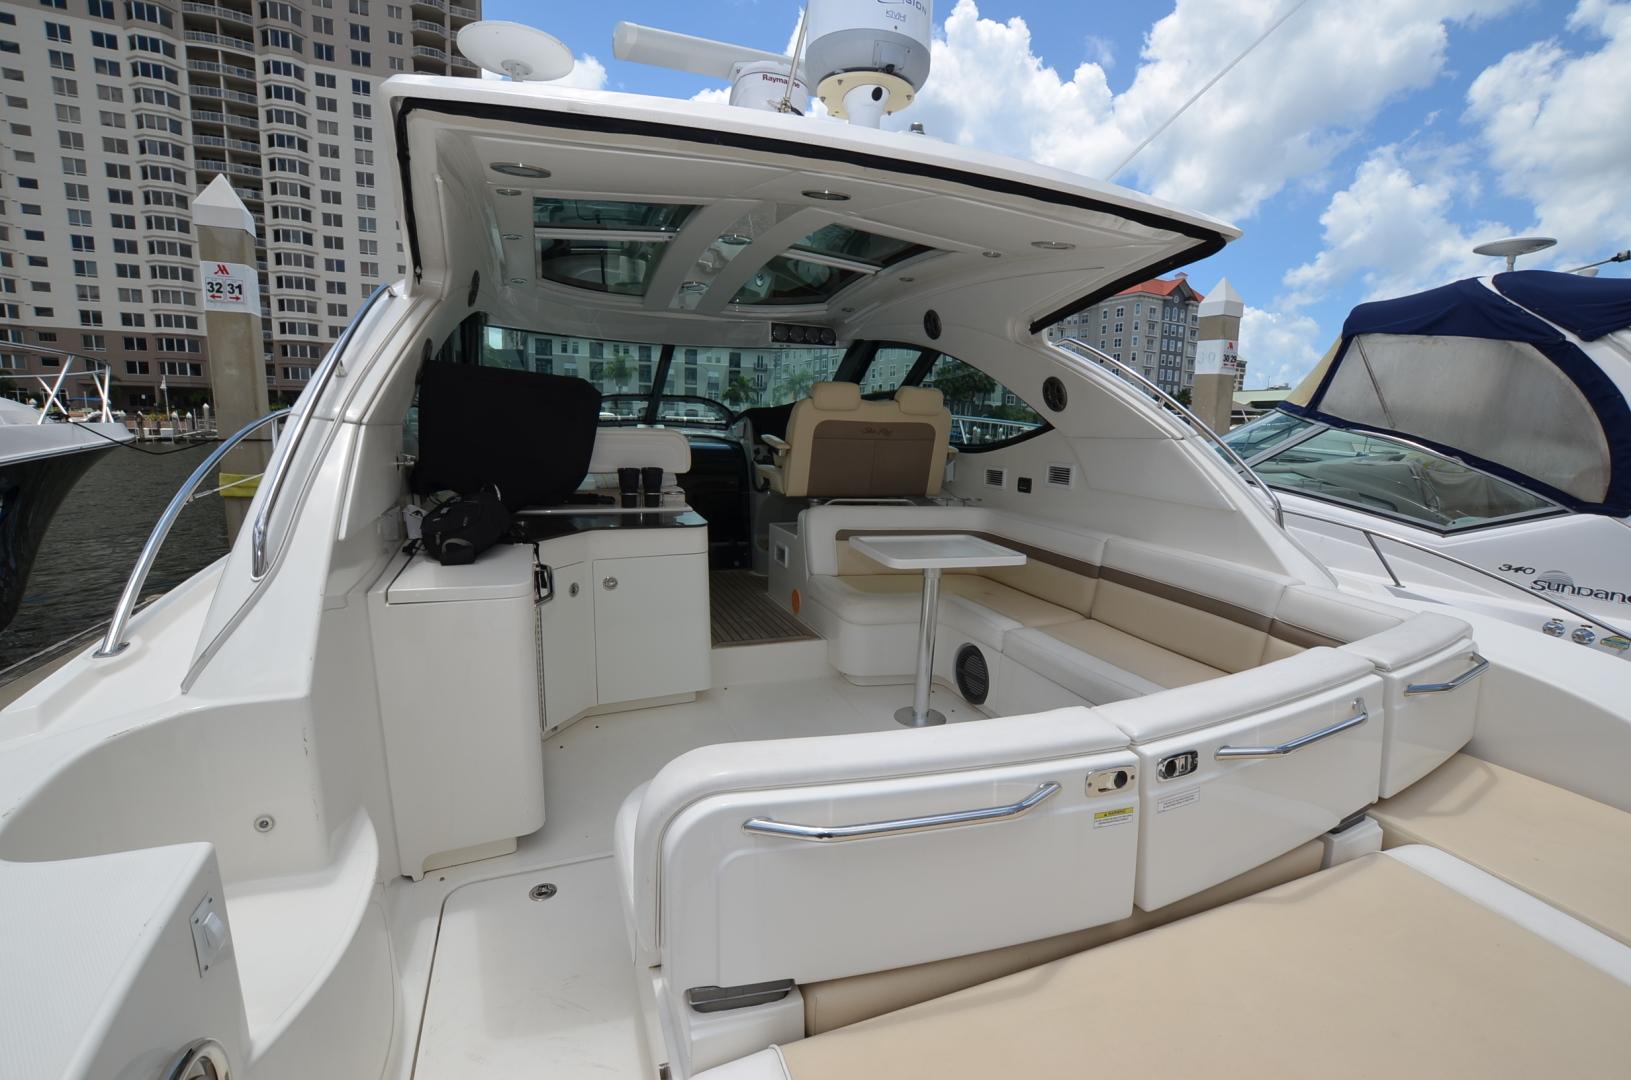 Sea Ray-470 Sundancer 2014-Madam Tampa-Florida-United States-1455548 | Thumbnail